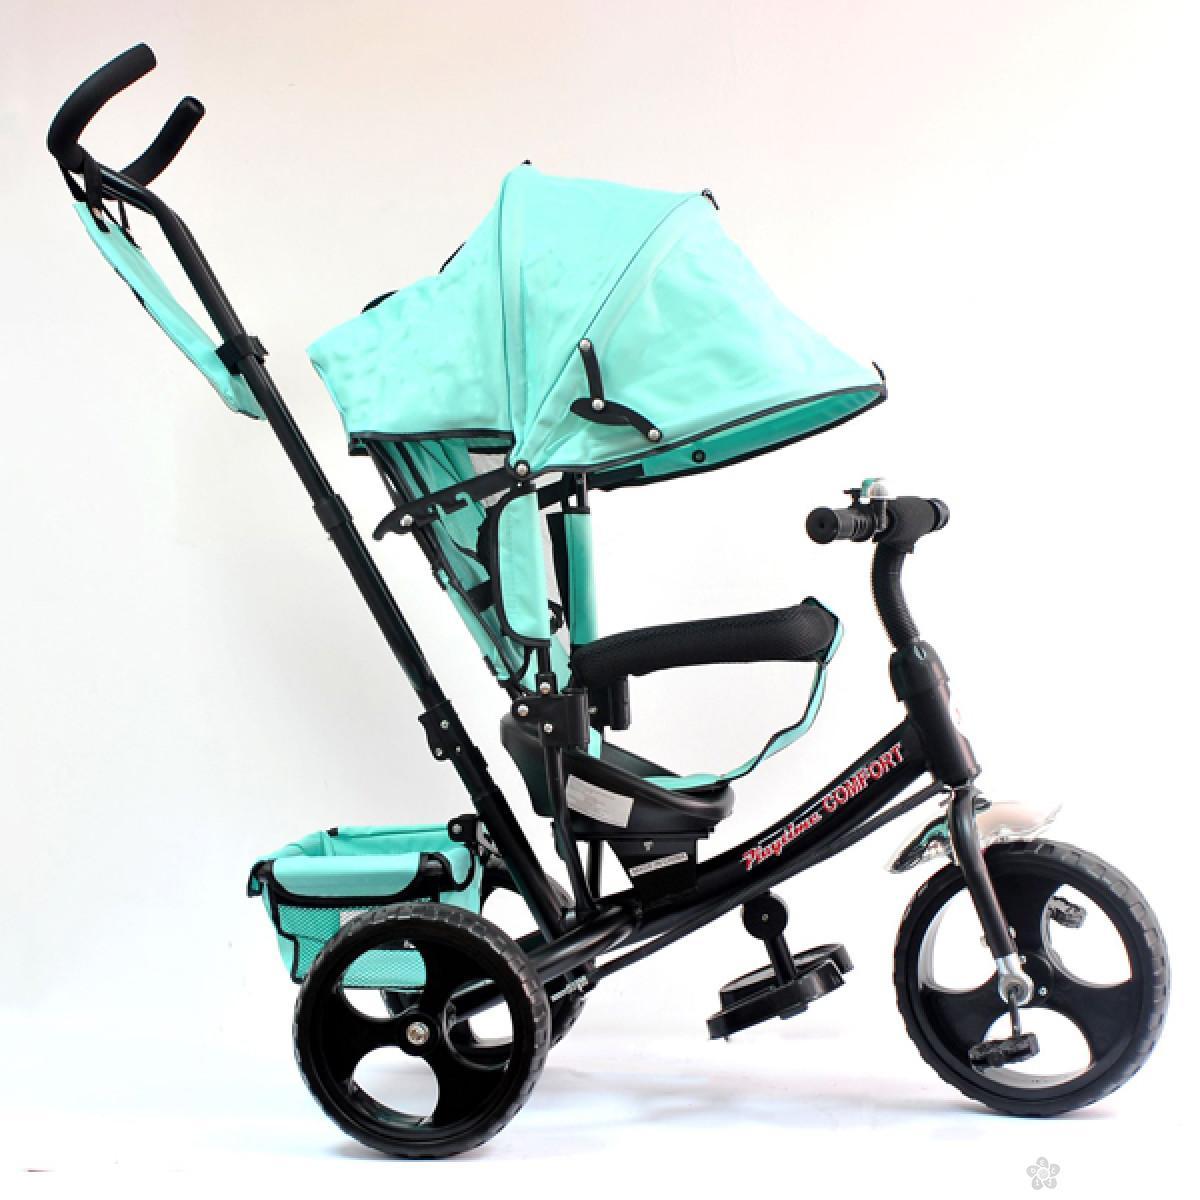 Tricikl Playtime,  model 417 COMFORT, MINT